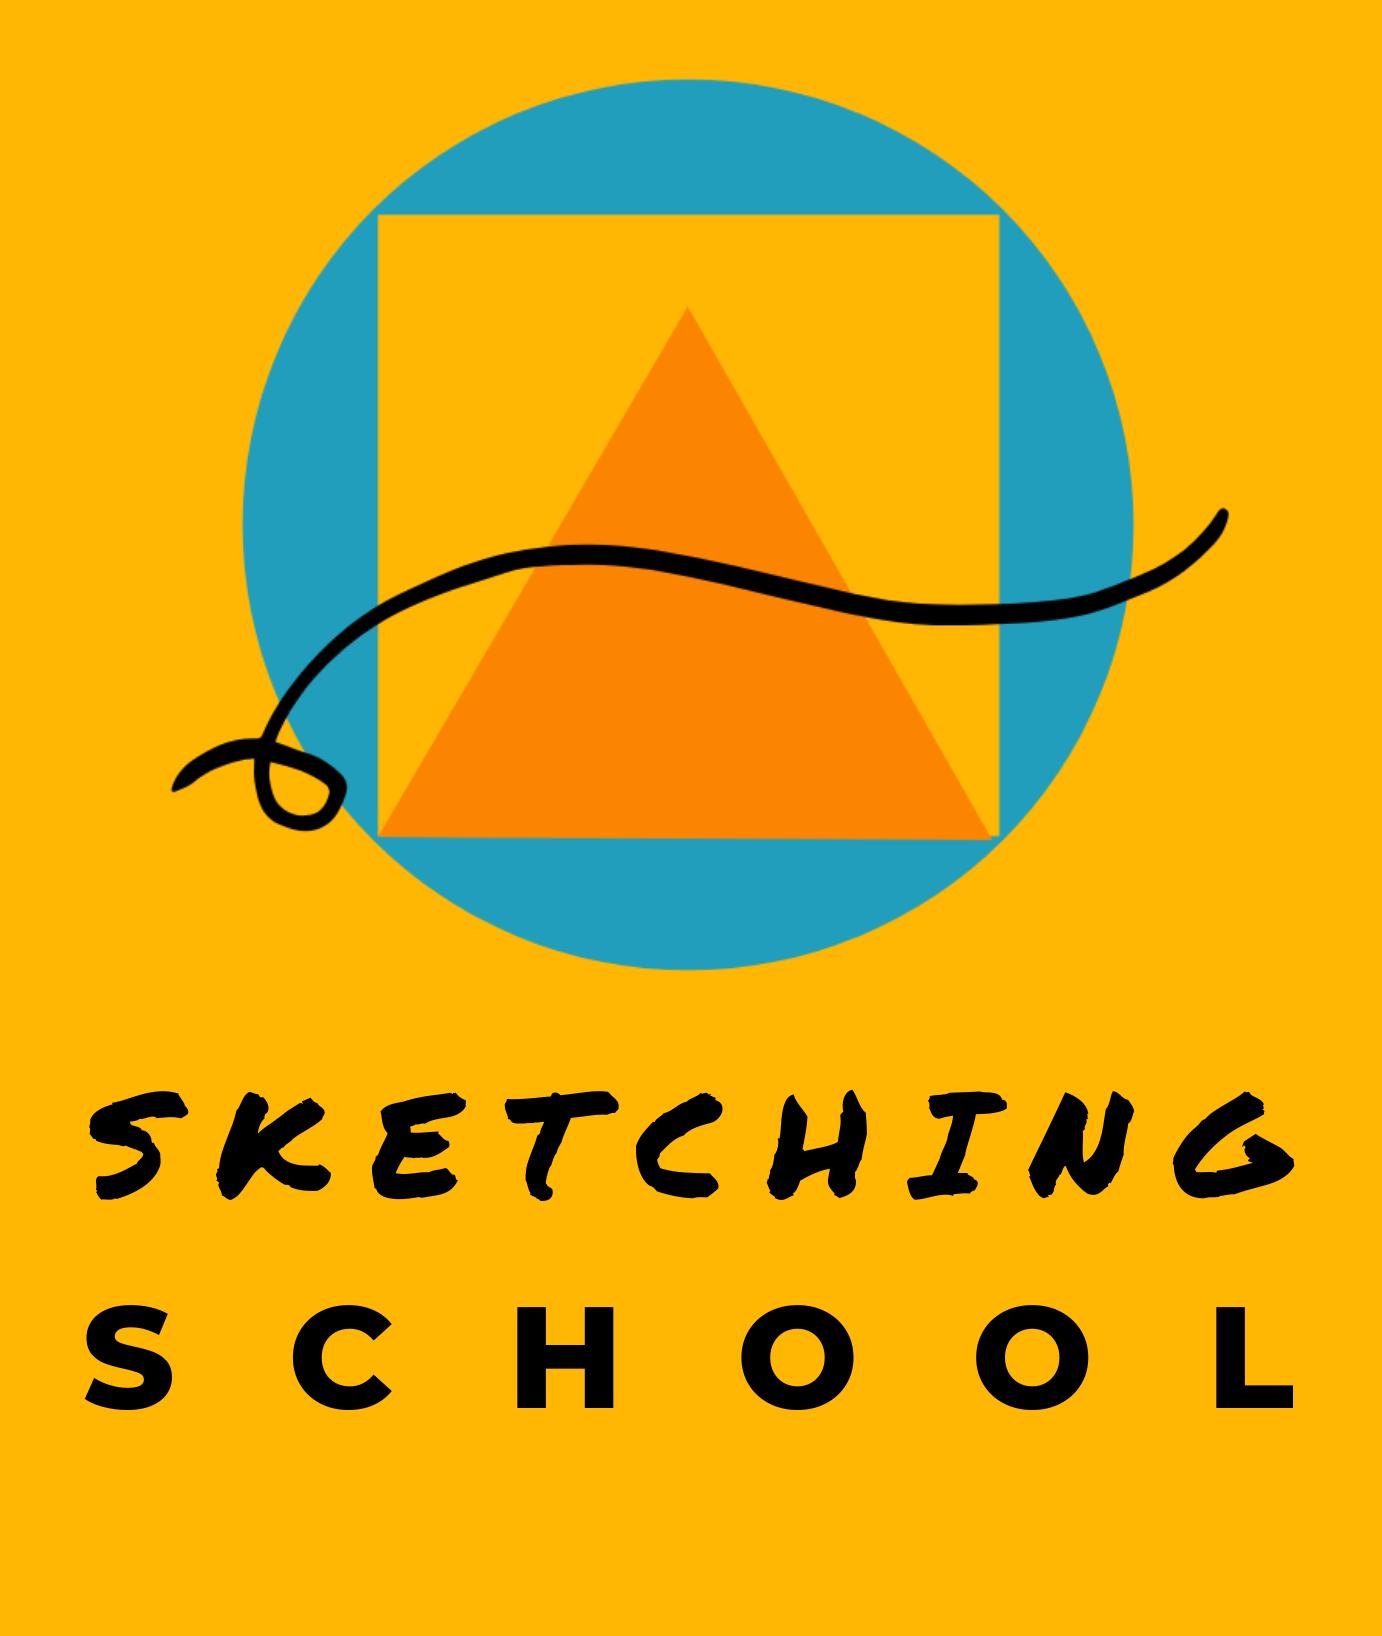 Sketching School.